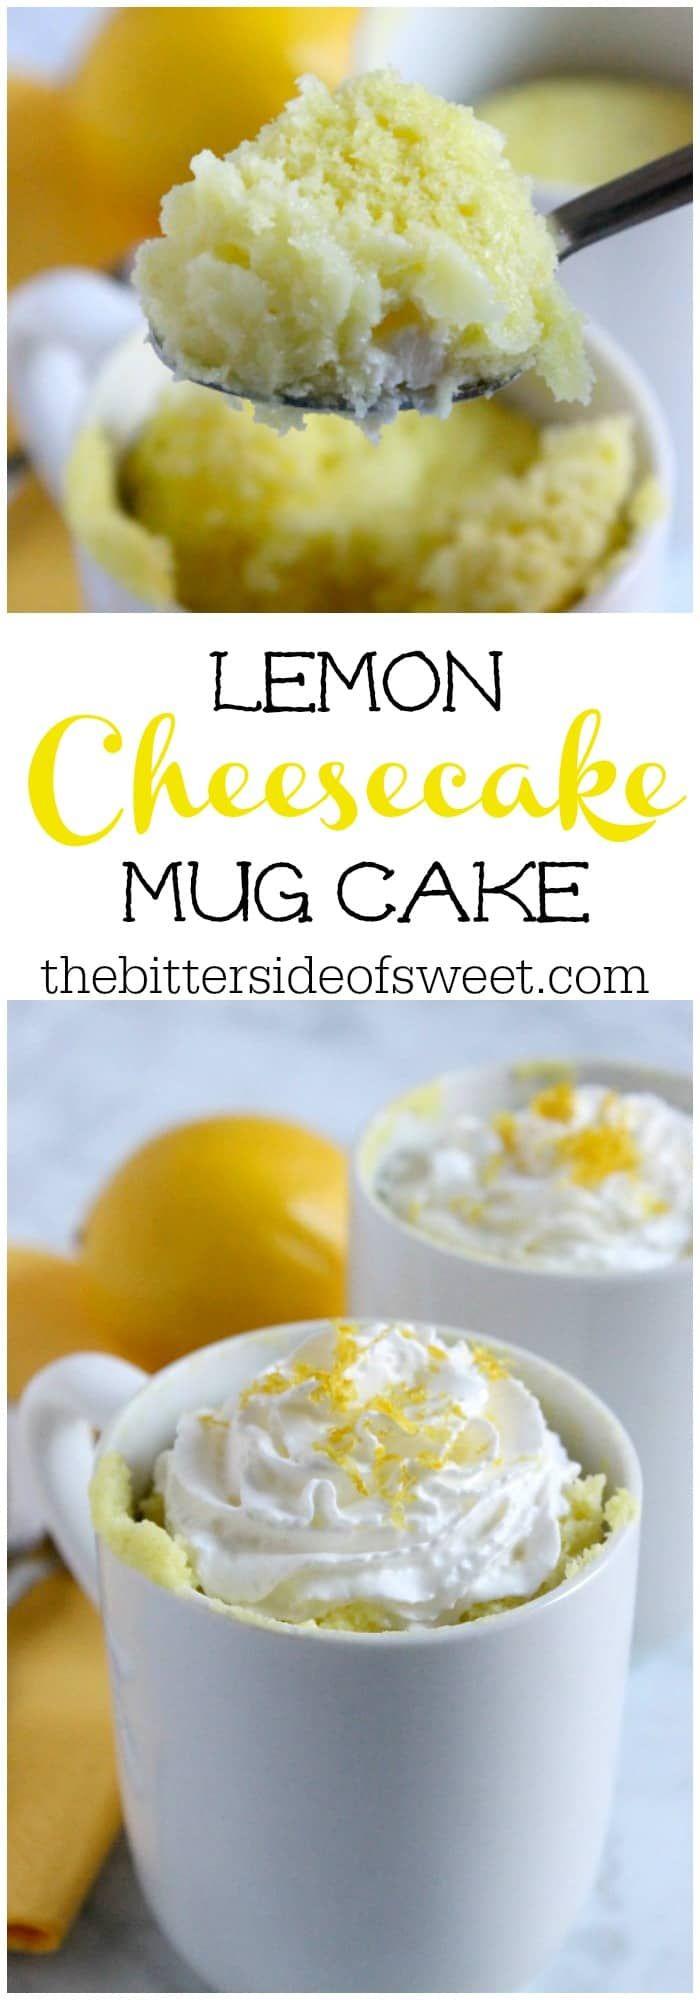 Lemon Cheesecake Mug Cake   The Bitter Side of Sweet #lemon #cake #cheesecake #mugcake